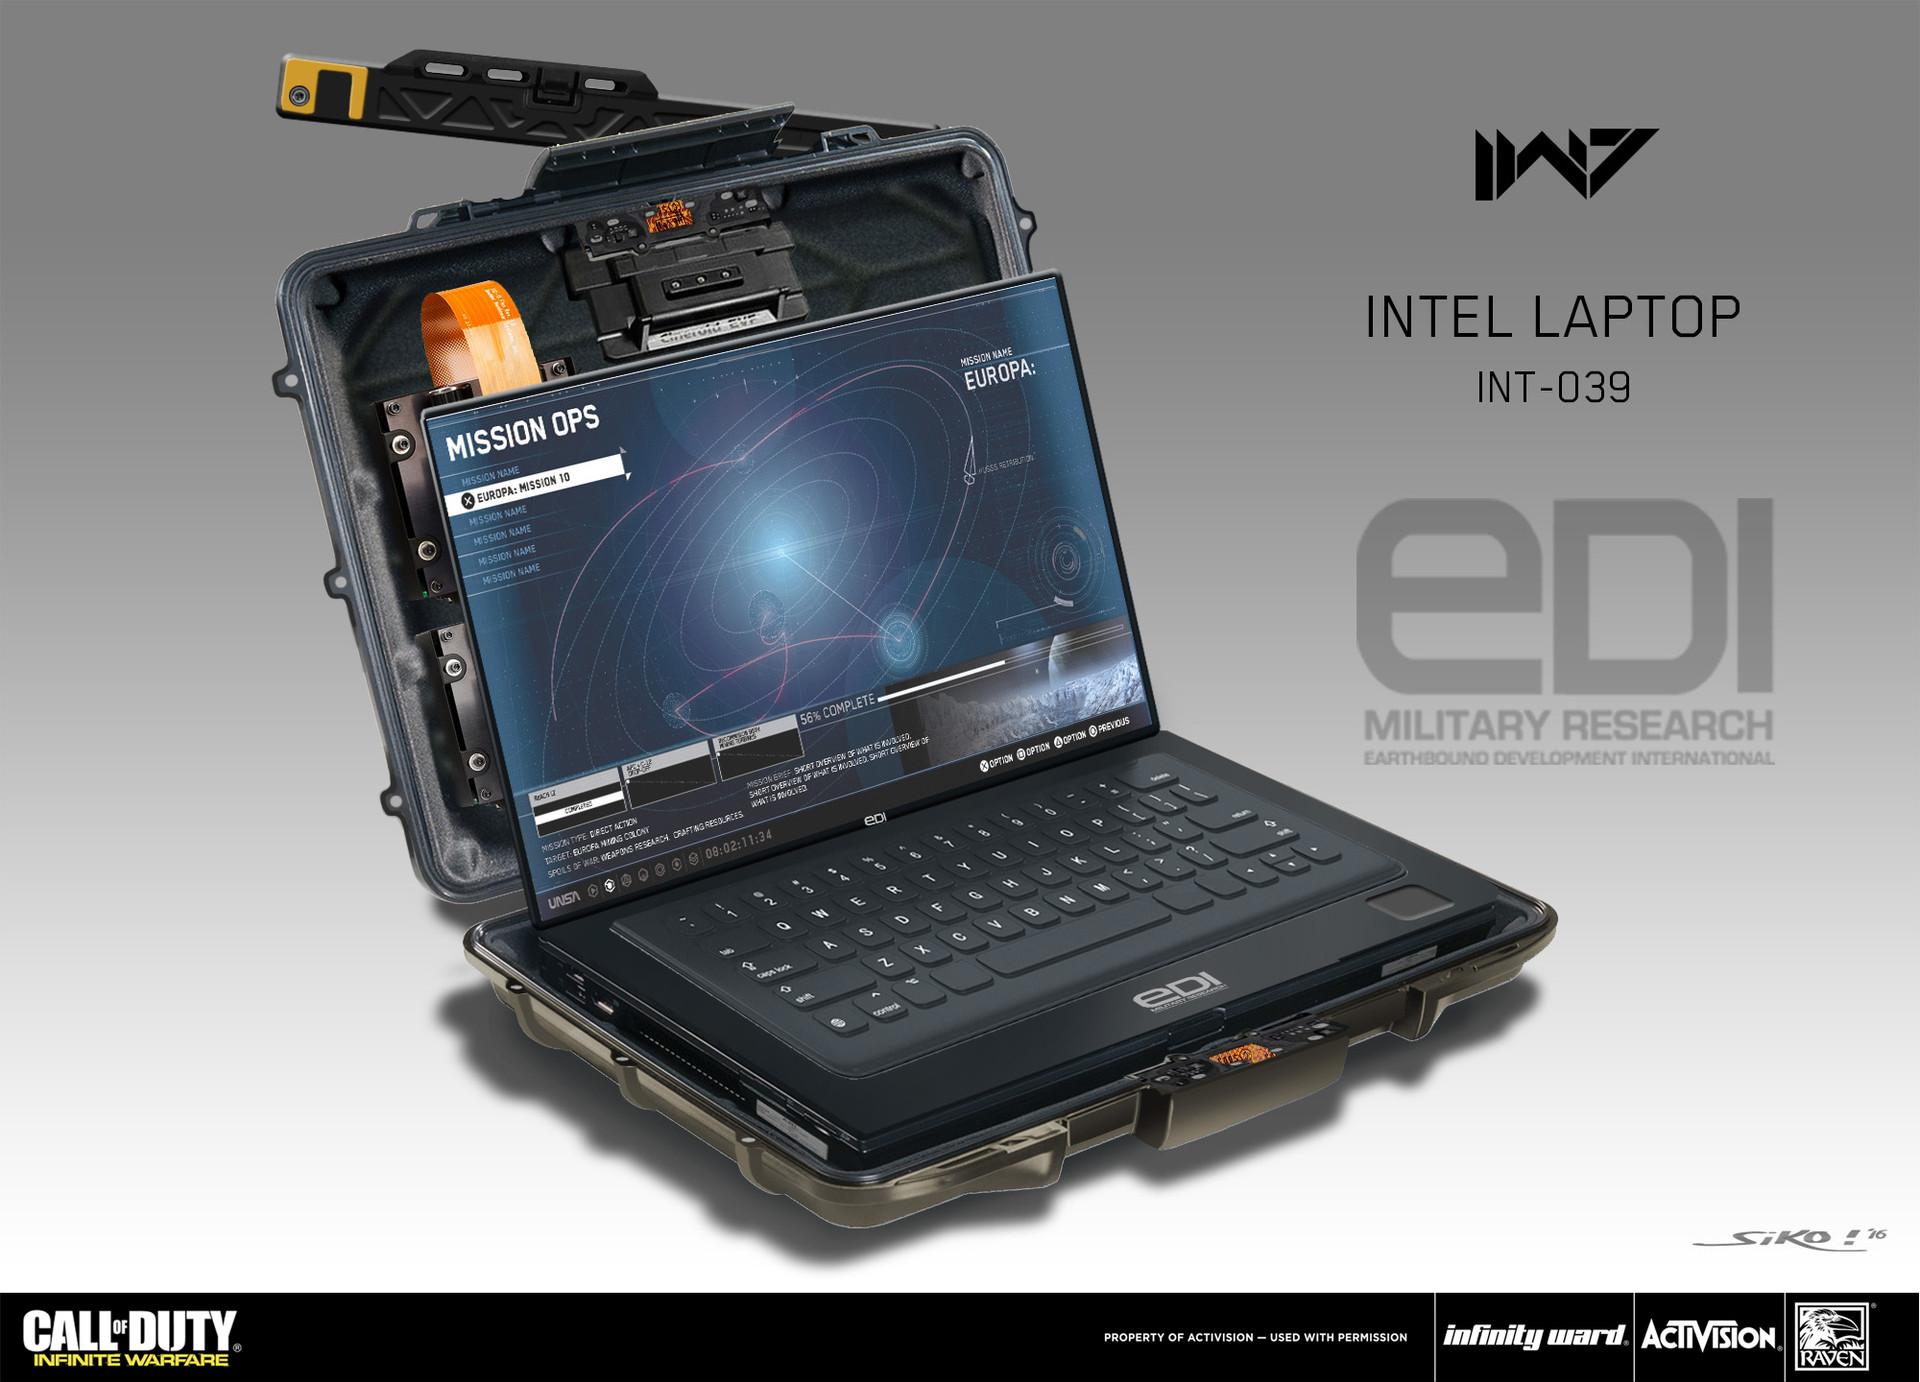 Simon ko prop sko iw7 03 31 16 intel laptop open